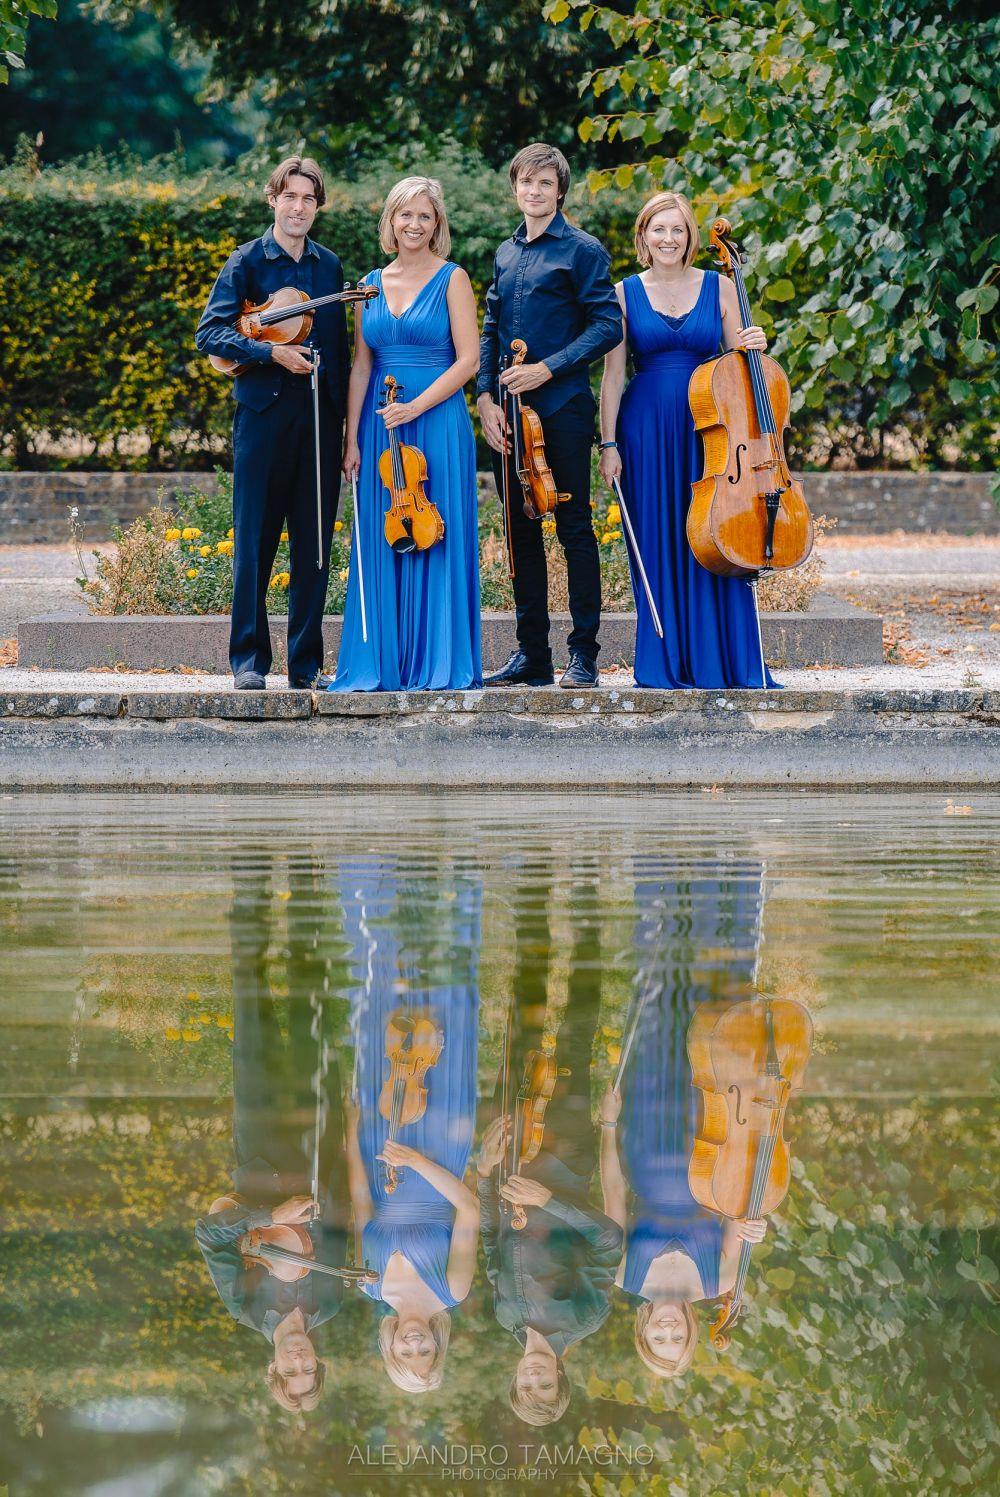 Sacconi Quartet Credit Alejandra Tamagno